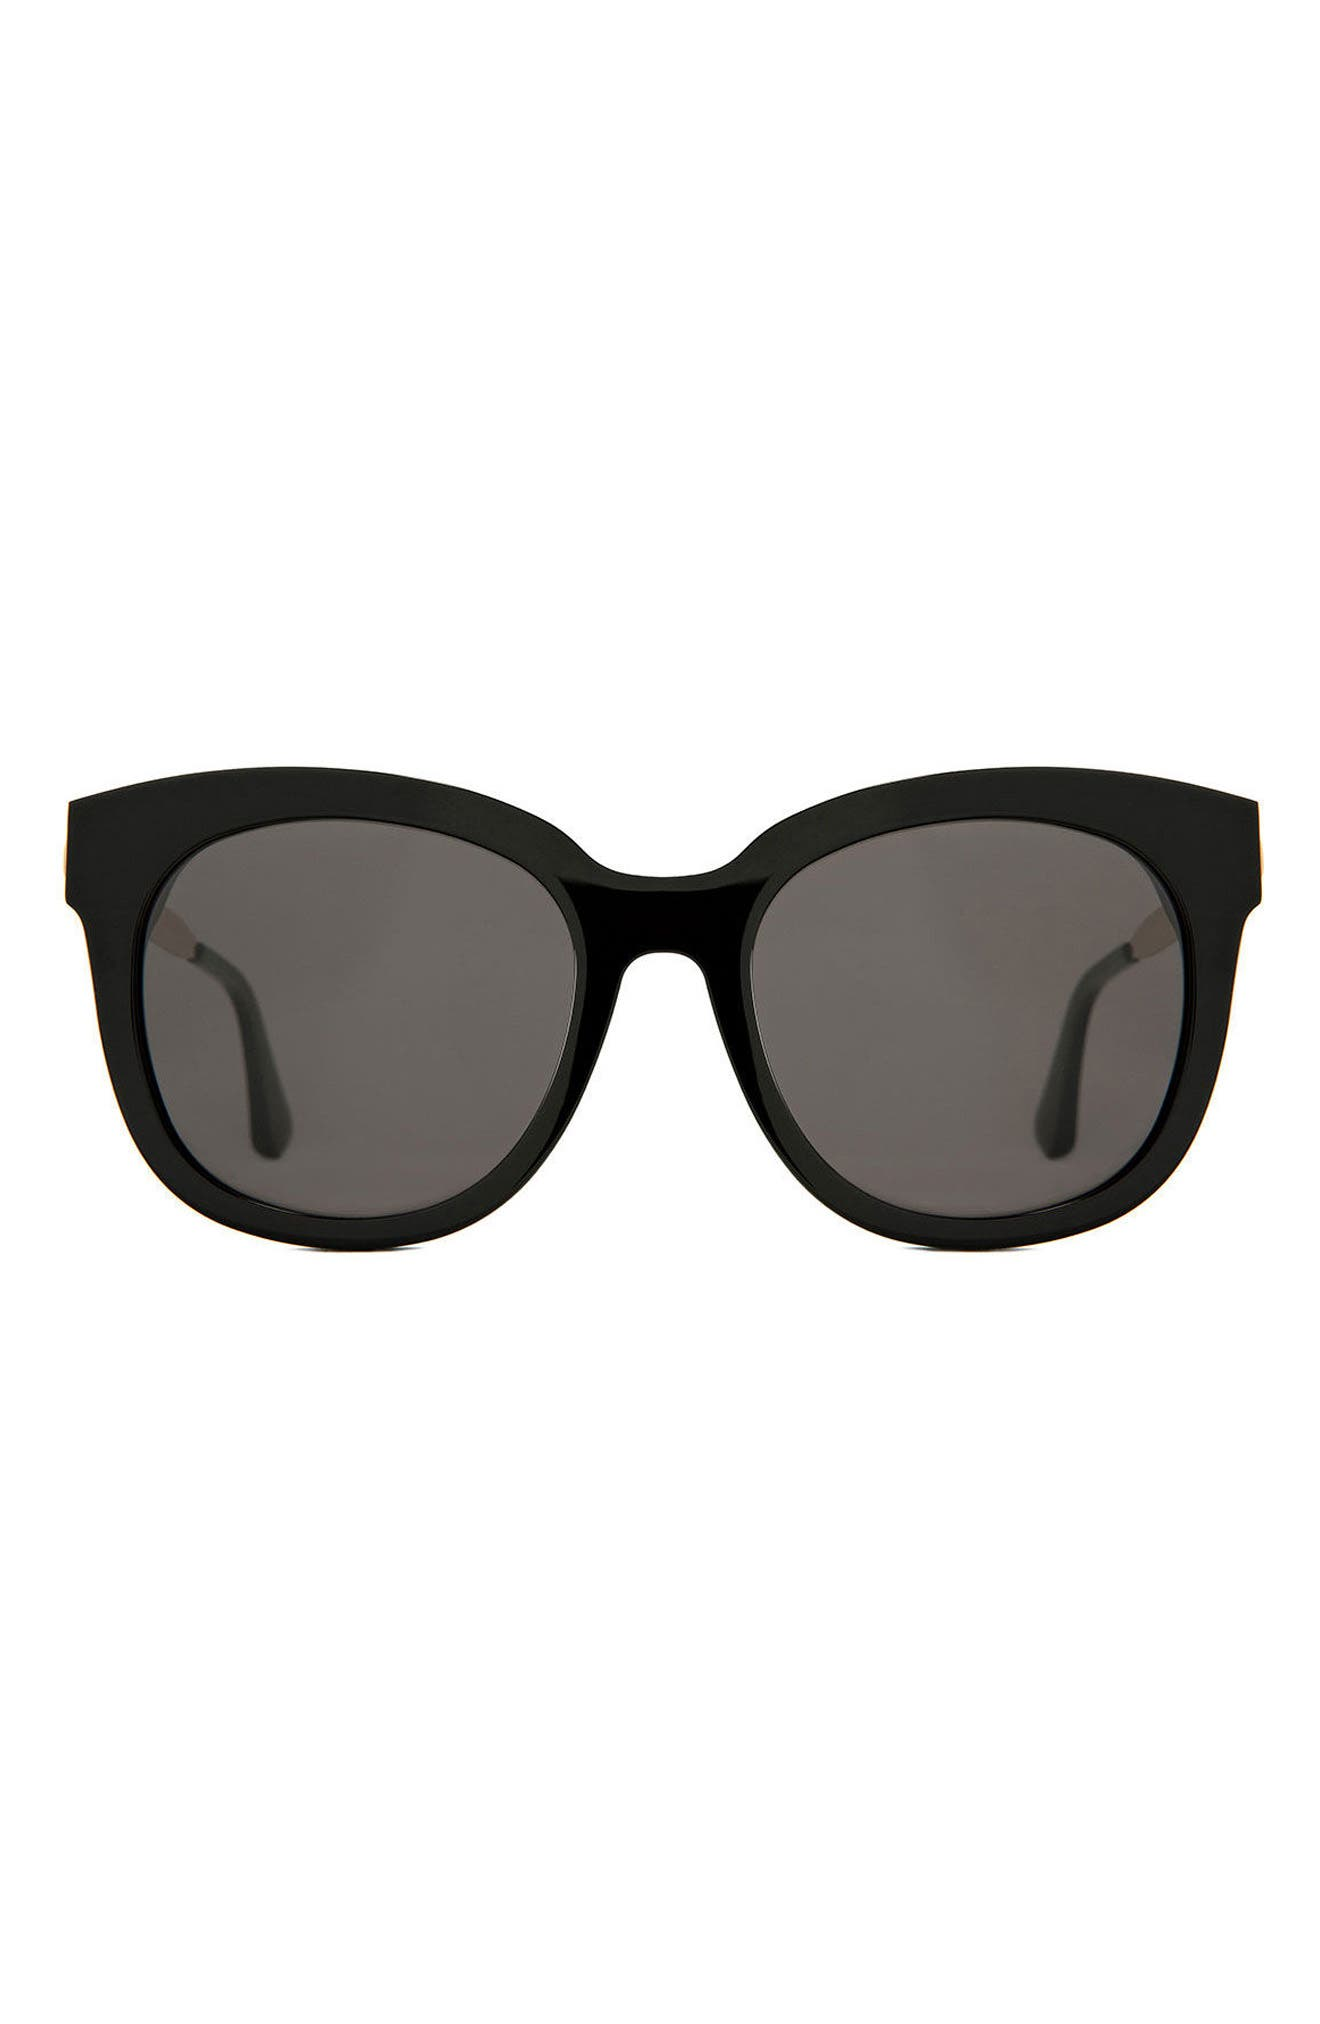 Cuba 55mm Sunglasses,                         Main,                         color, 001